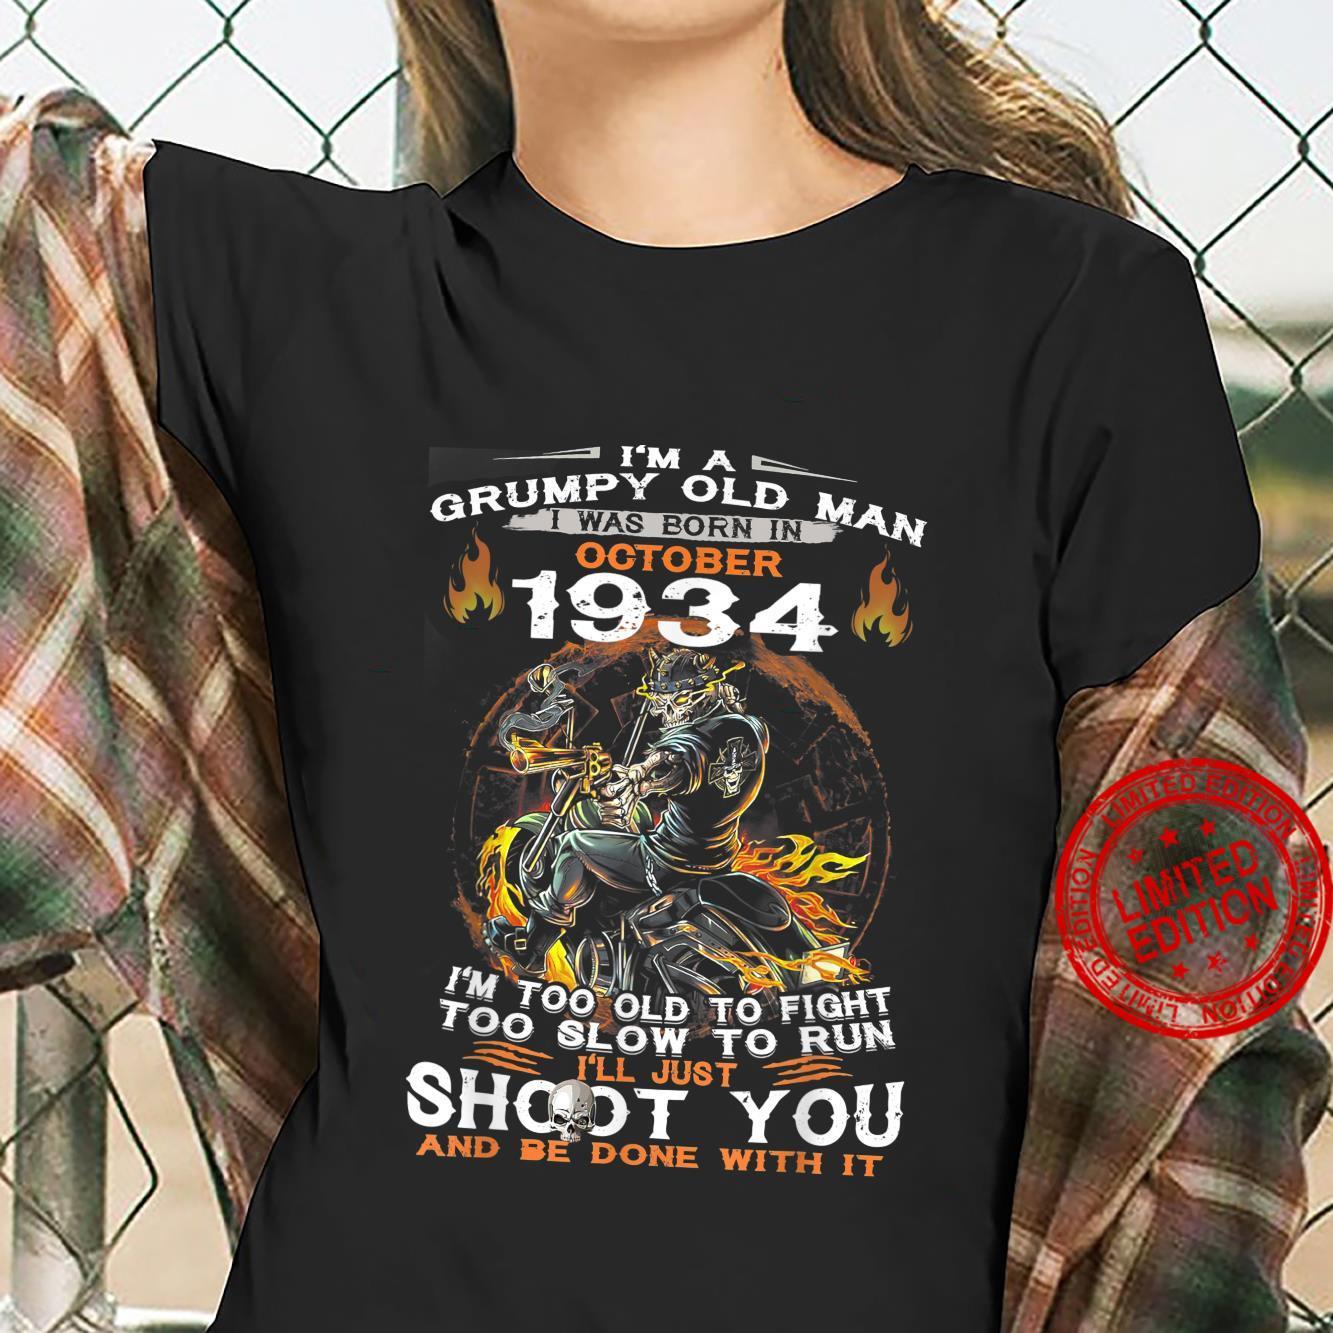 I'm A Grumpy Old Man I Was Born In OCTOBER 1935 Shirt ladies tee